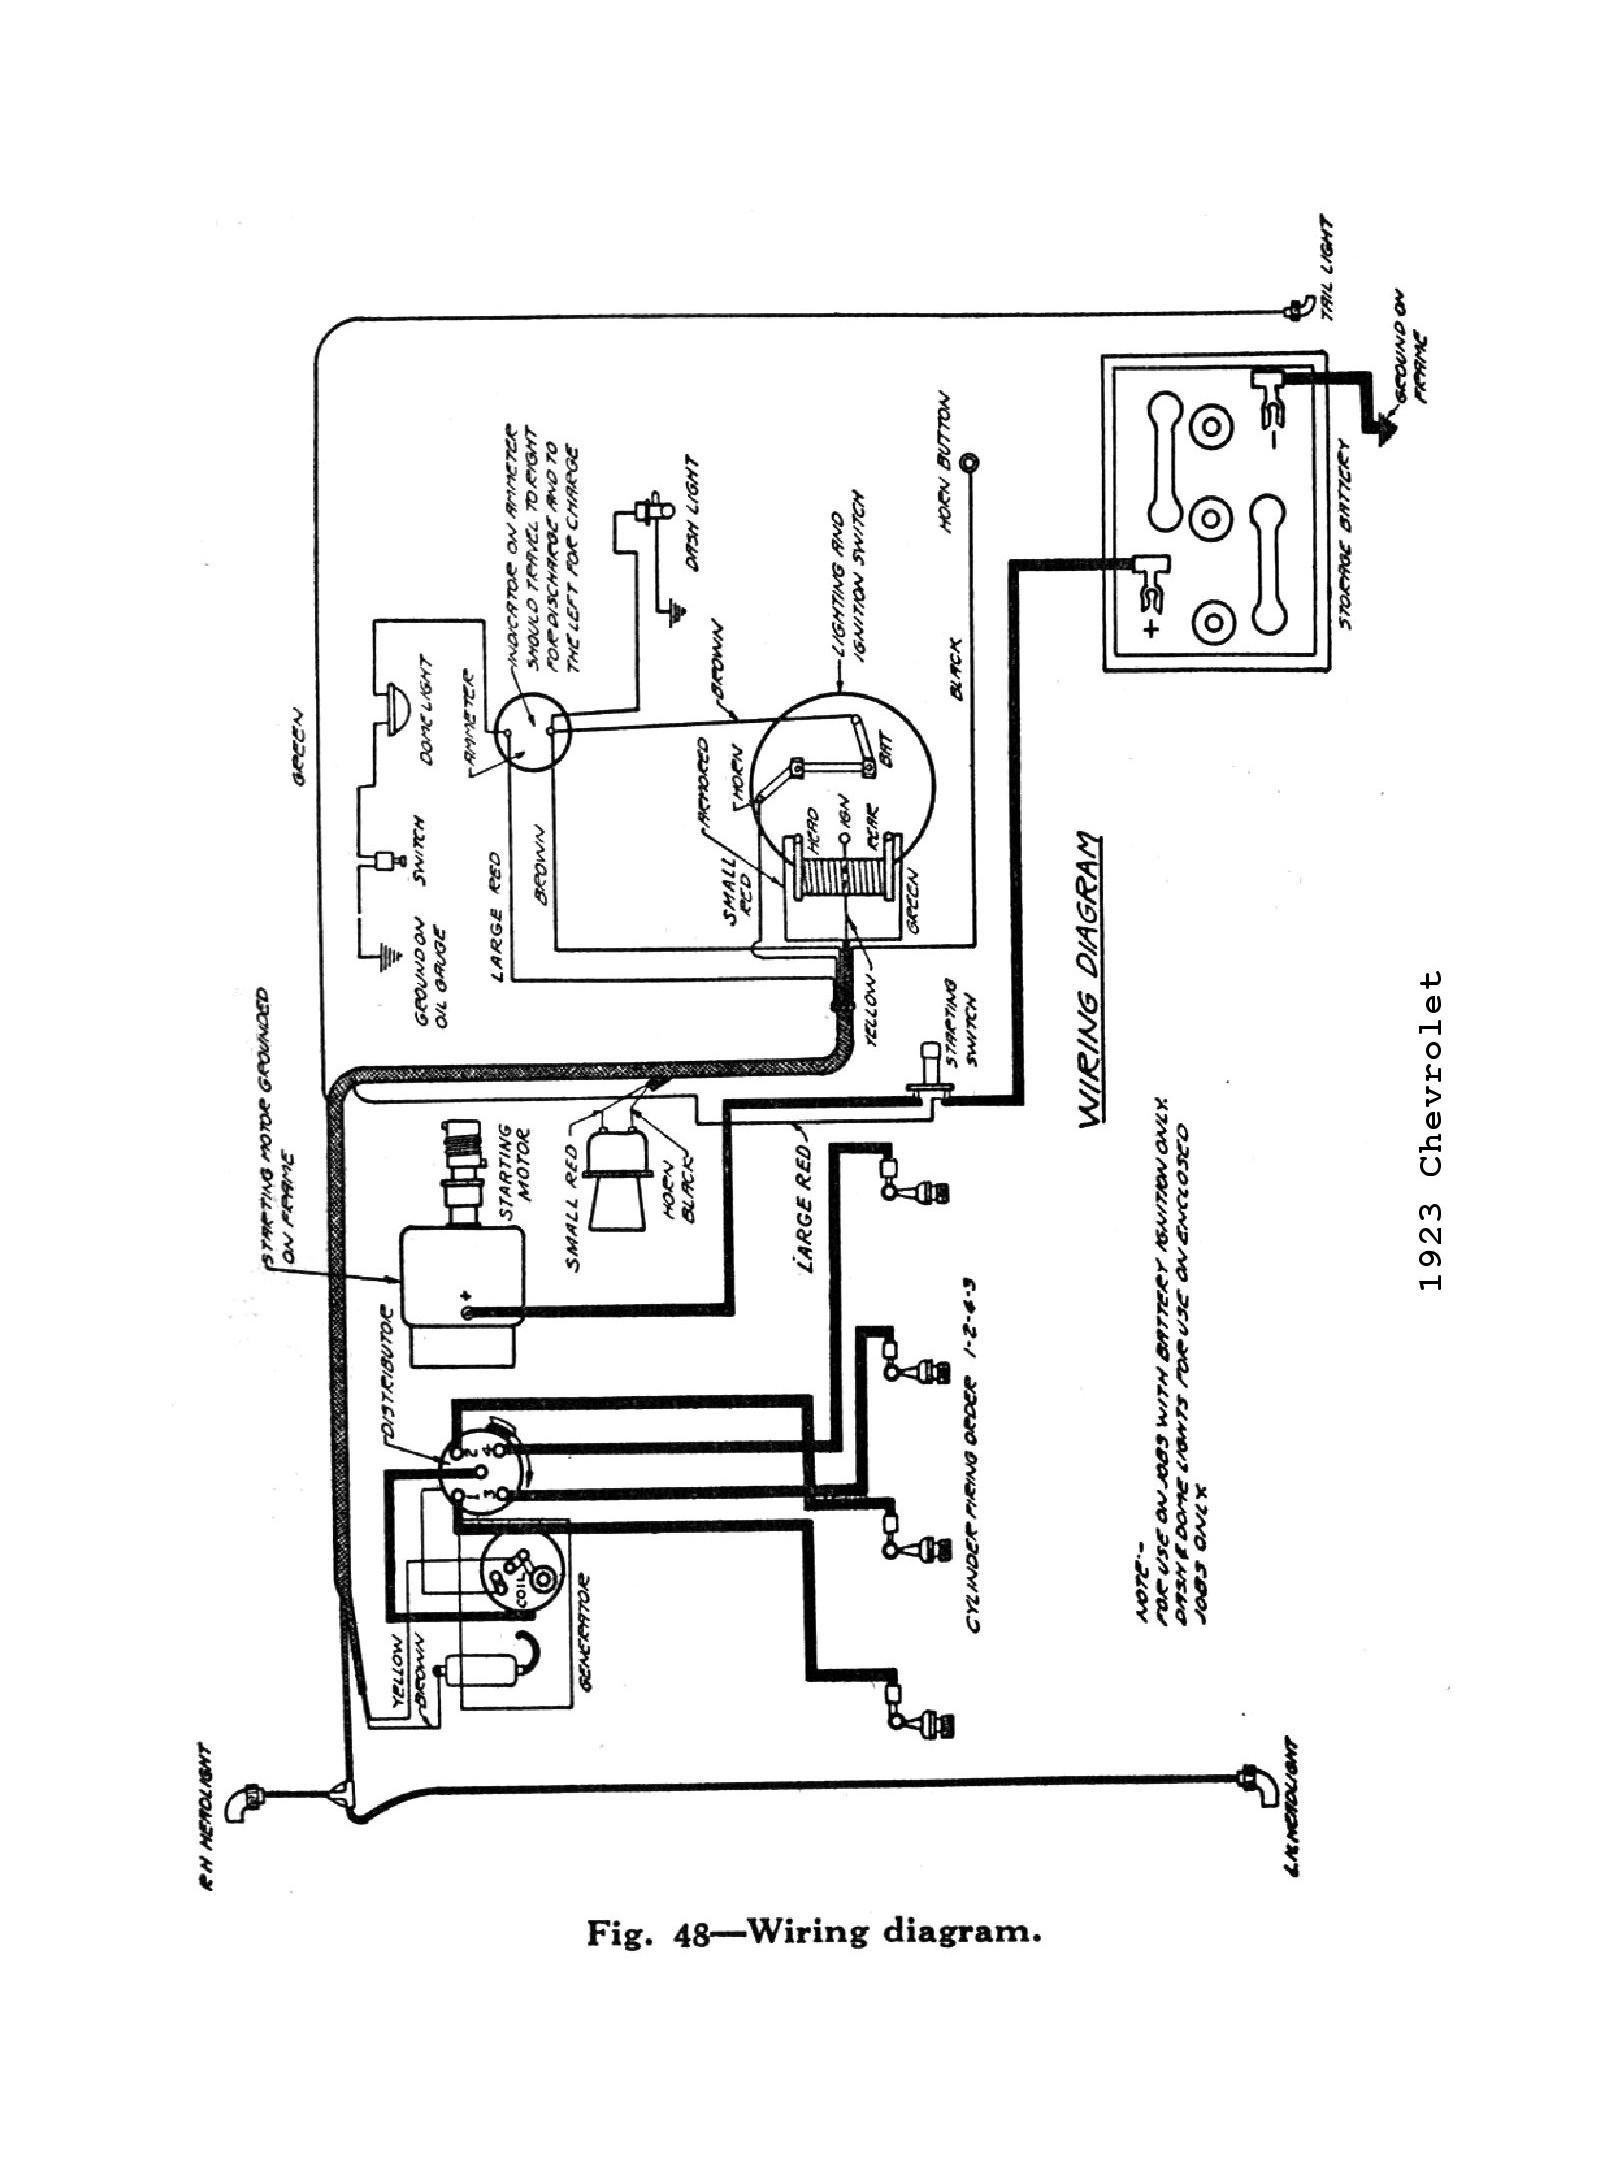 216 chevy engine diagram wiring diagrams my wiring diagram rh detoxicrecenze com Chevy S10 2.2L Engine Diagram Chevy S10 2.2L Engine Diagram